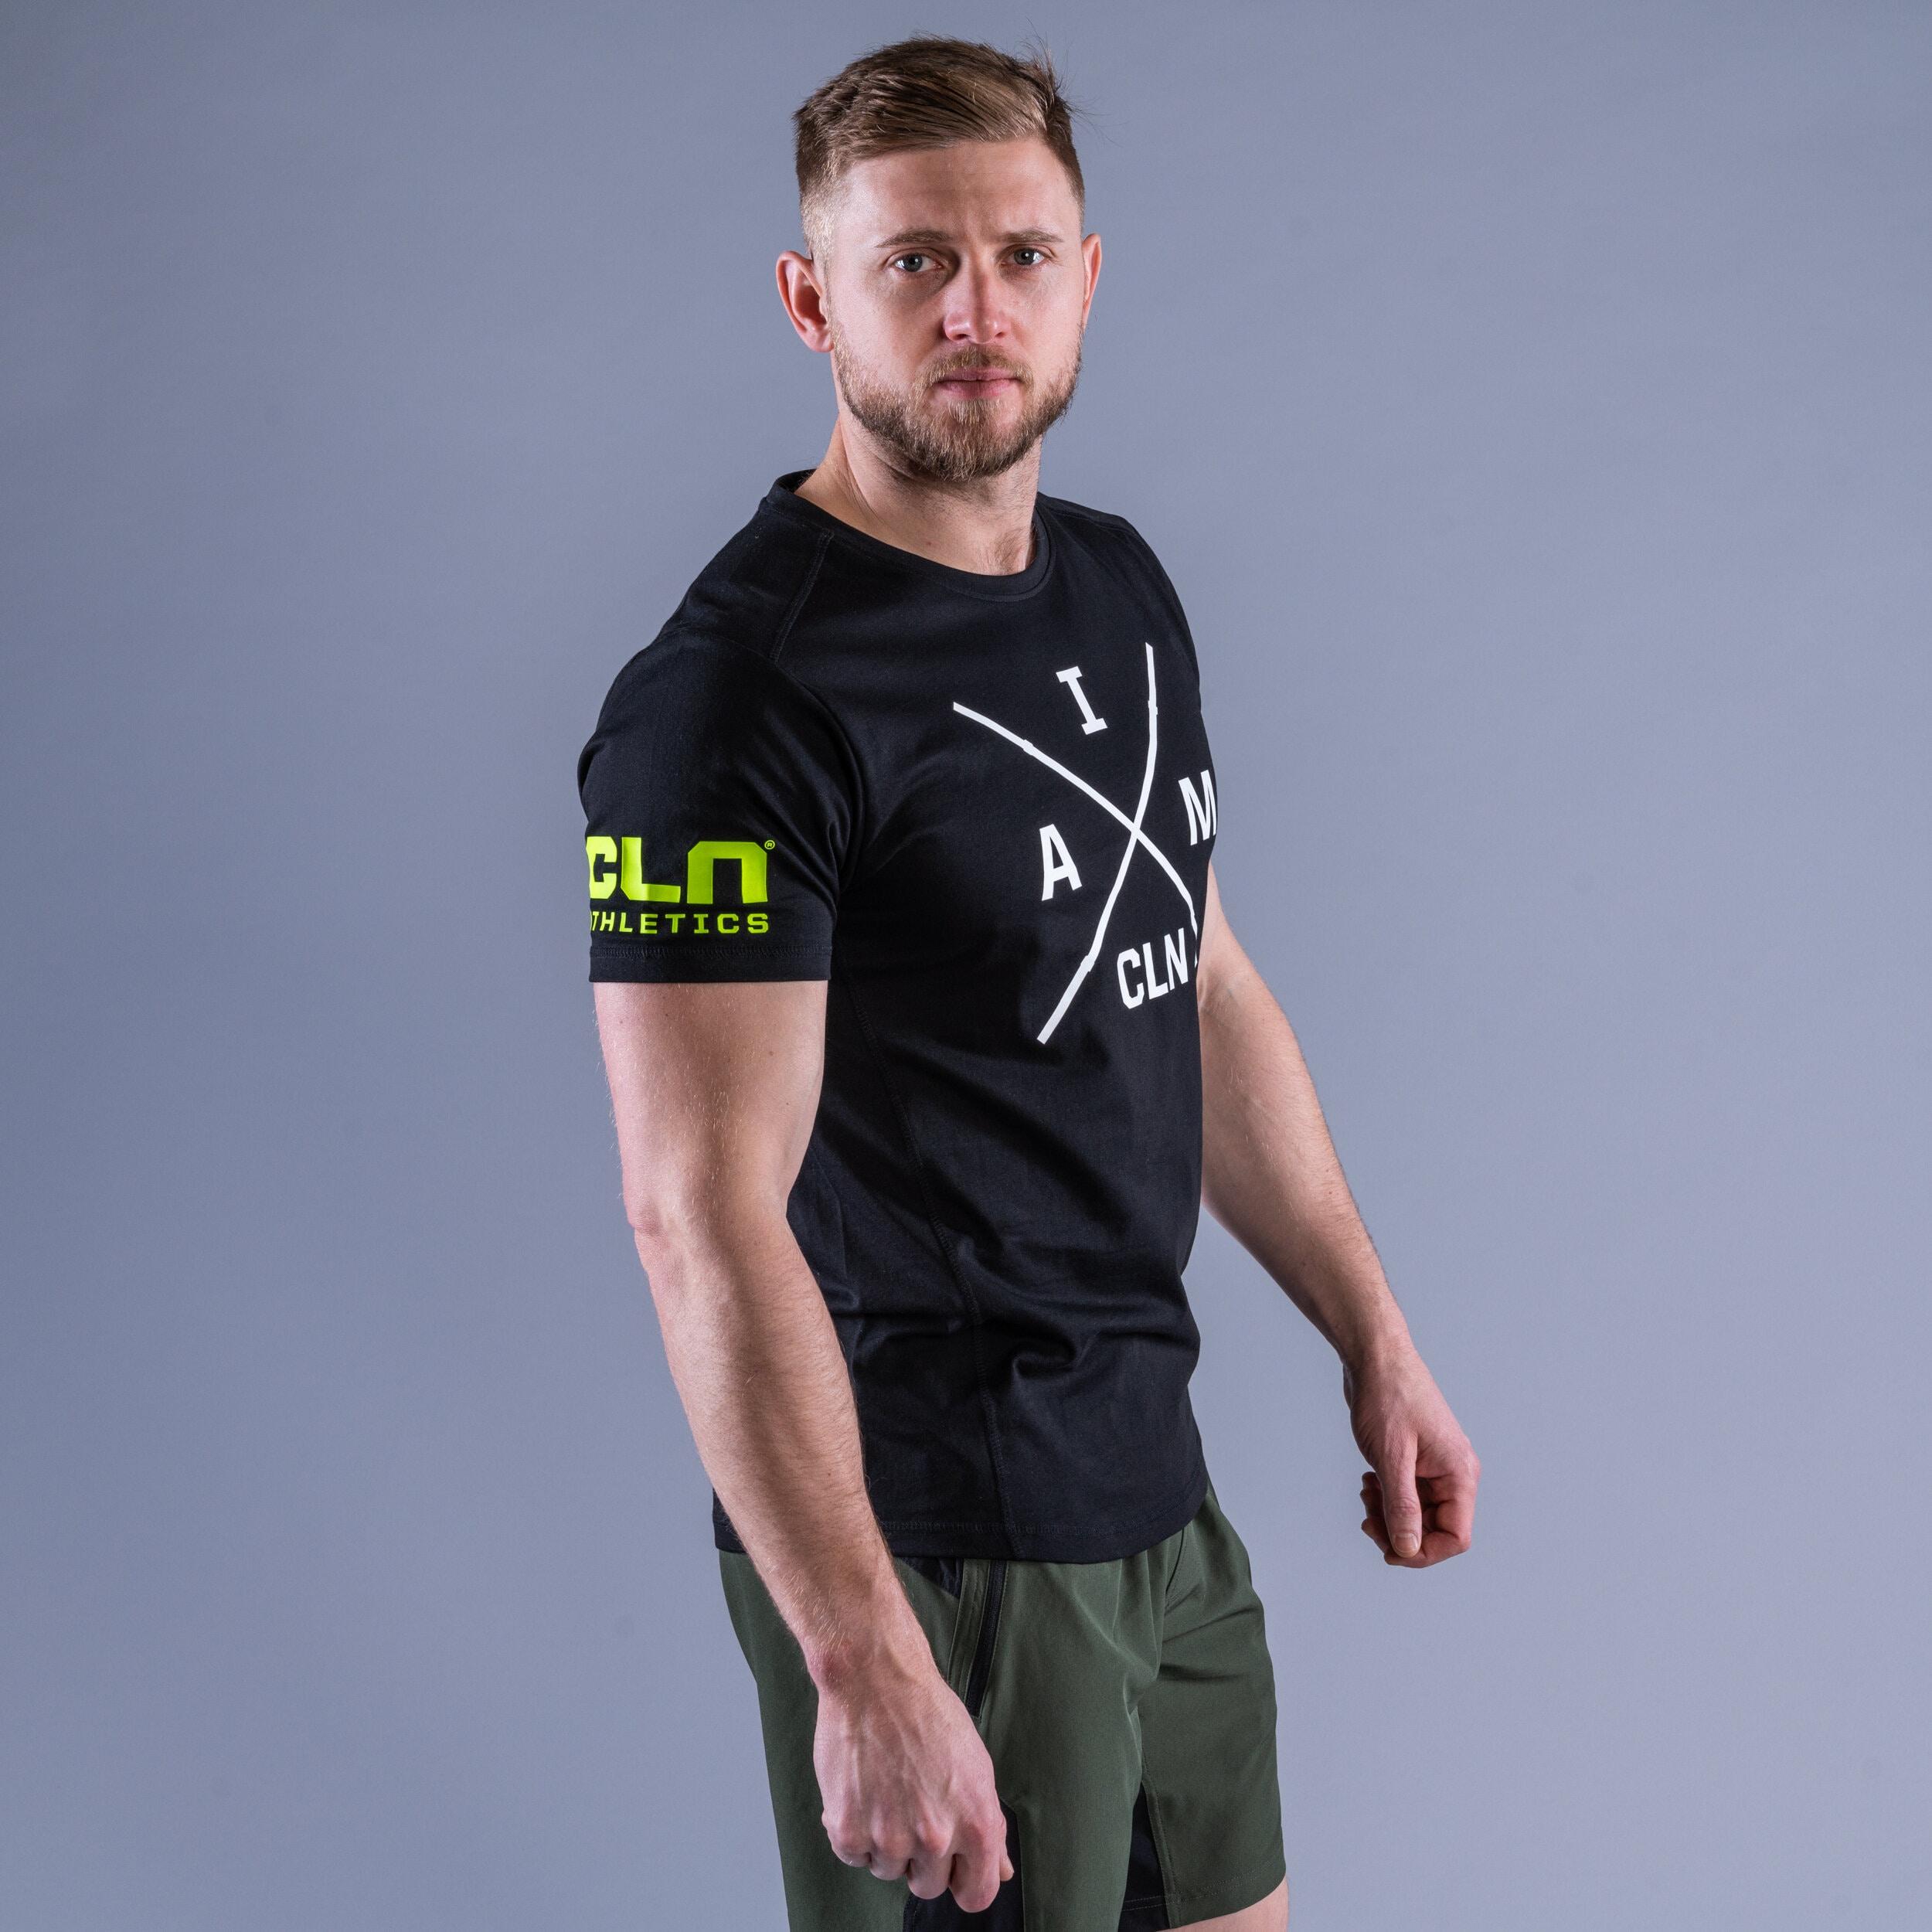 CLN Instructor t-shirt Black